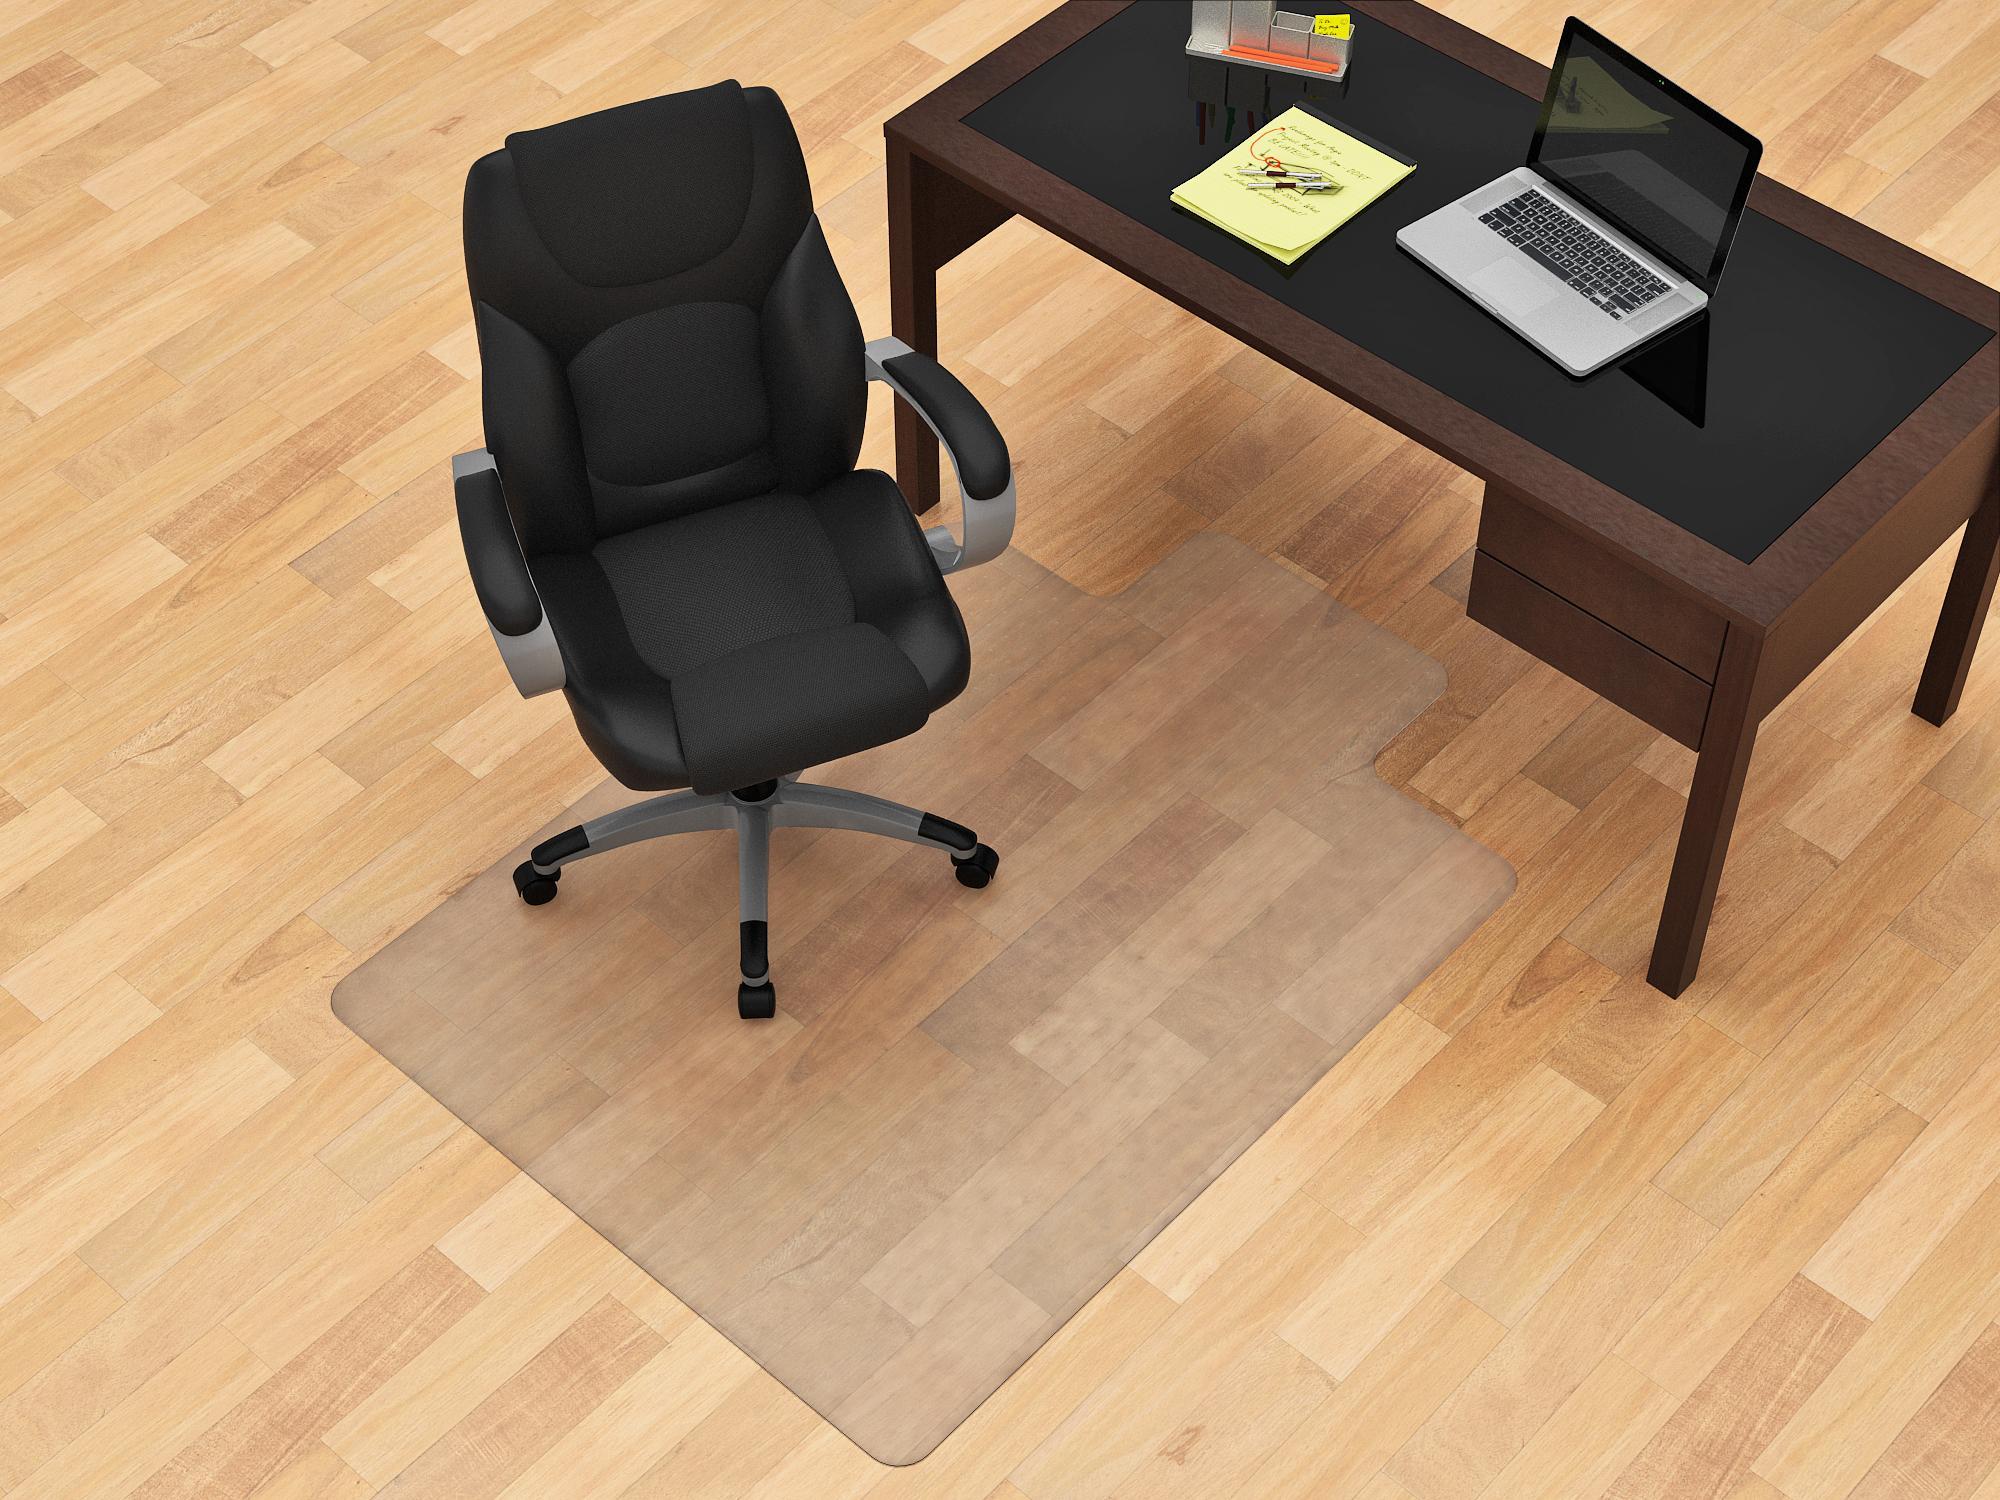 45 X 53 Hardfloor Chairmat 46 30 Ojcommerce